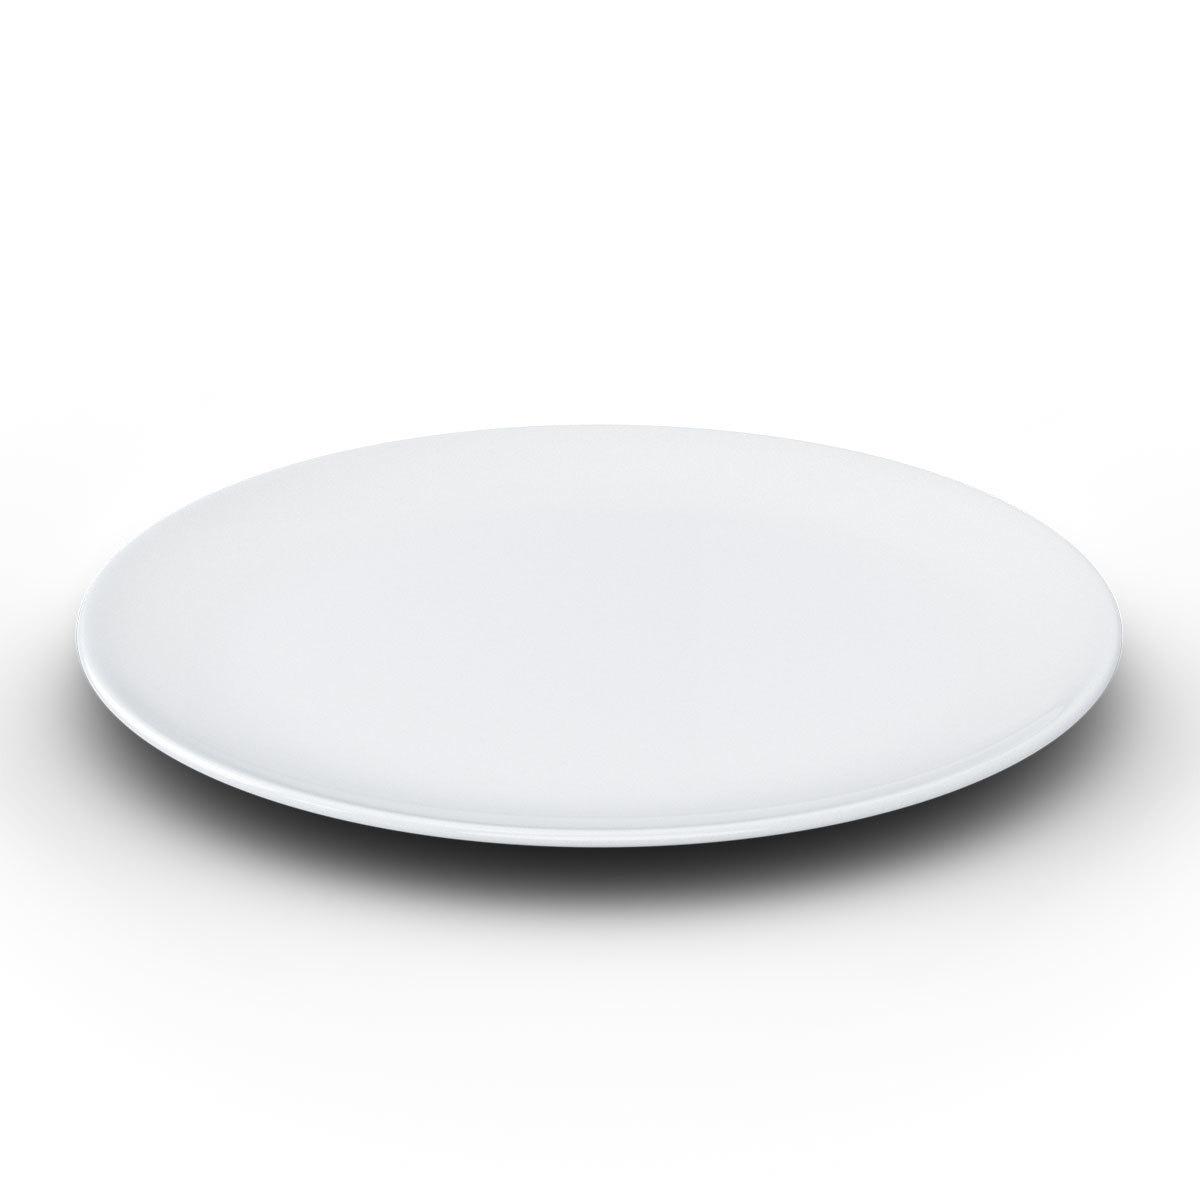 My favorite grandma type wall plate